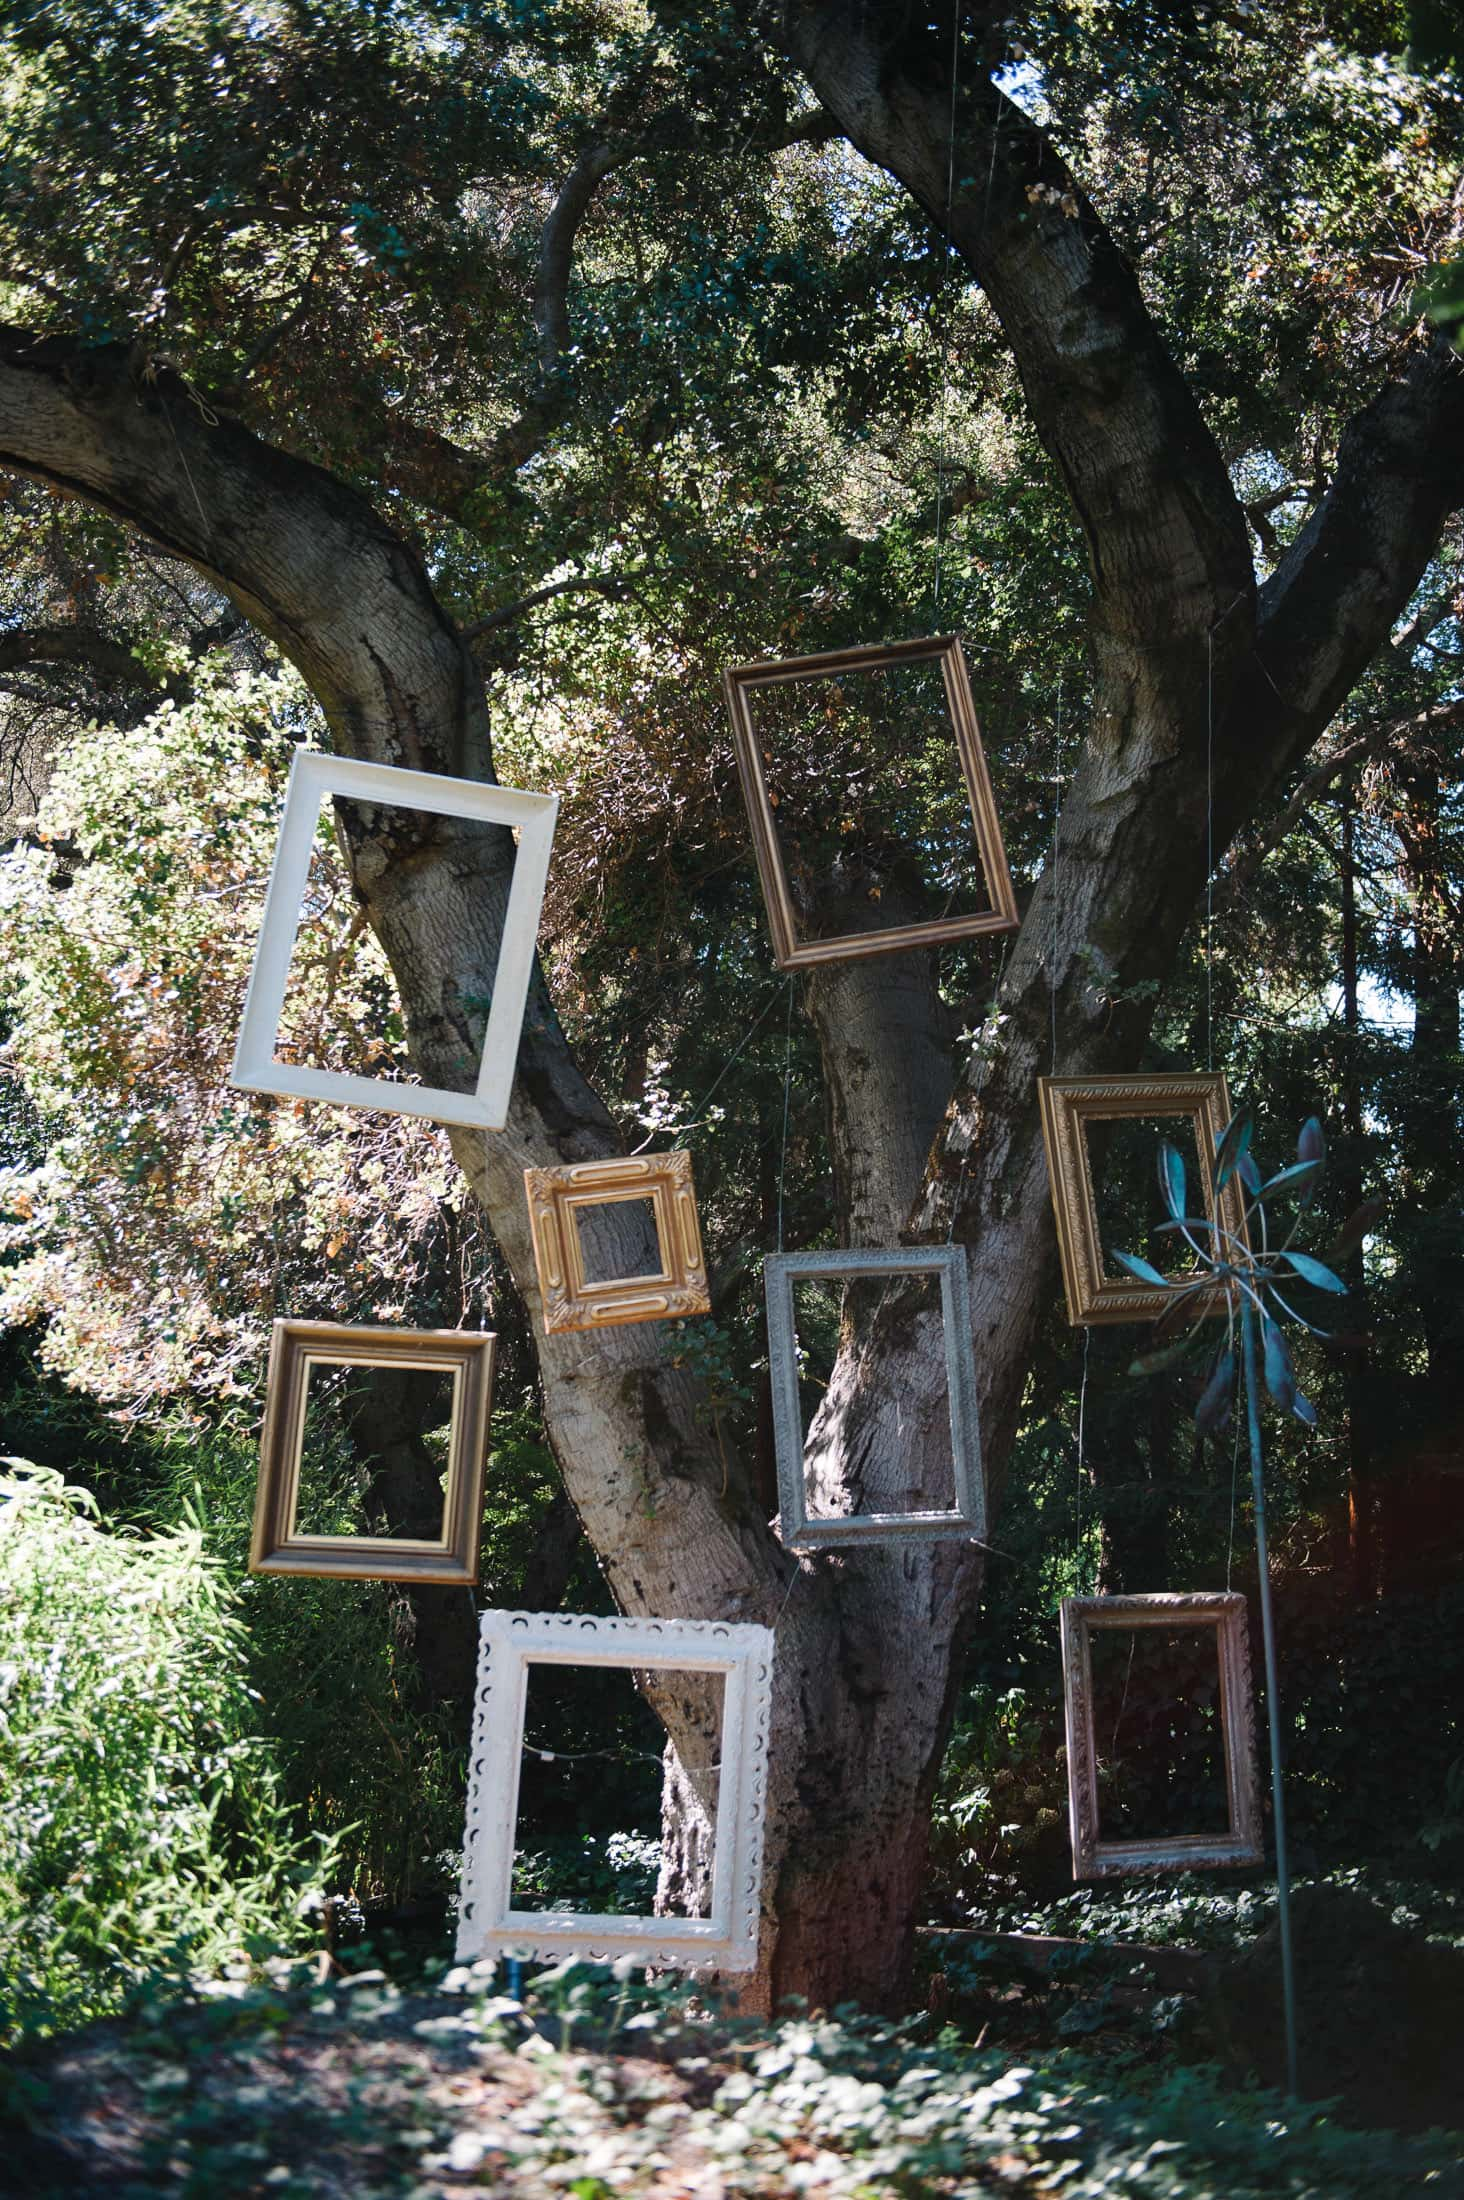 Picture Frames at Alice in Wonderland Victorian Mad Hatter Garden wedding in Atherton, CA